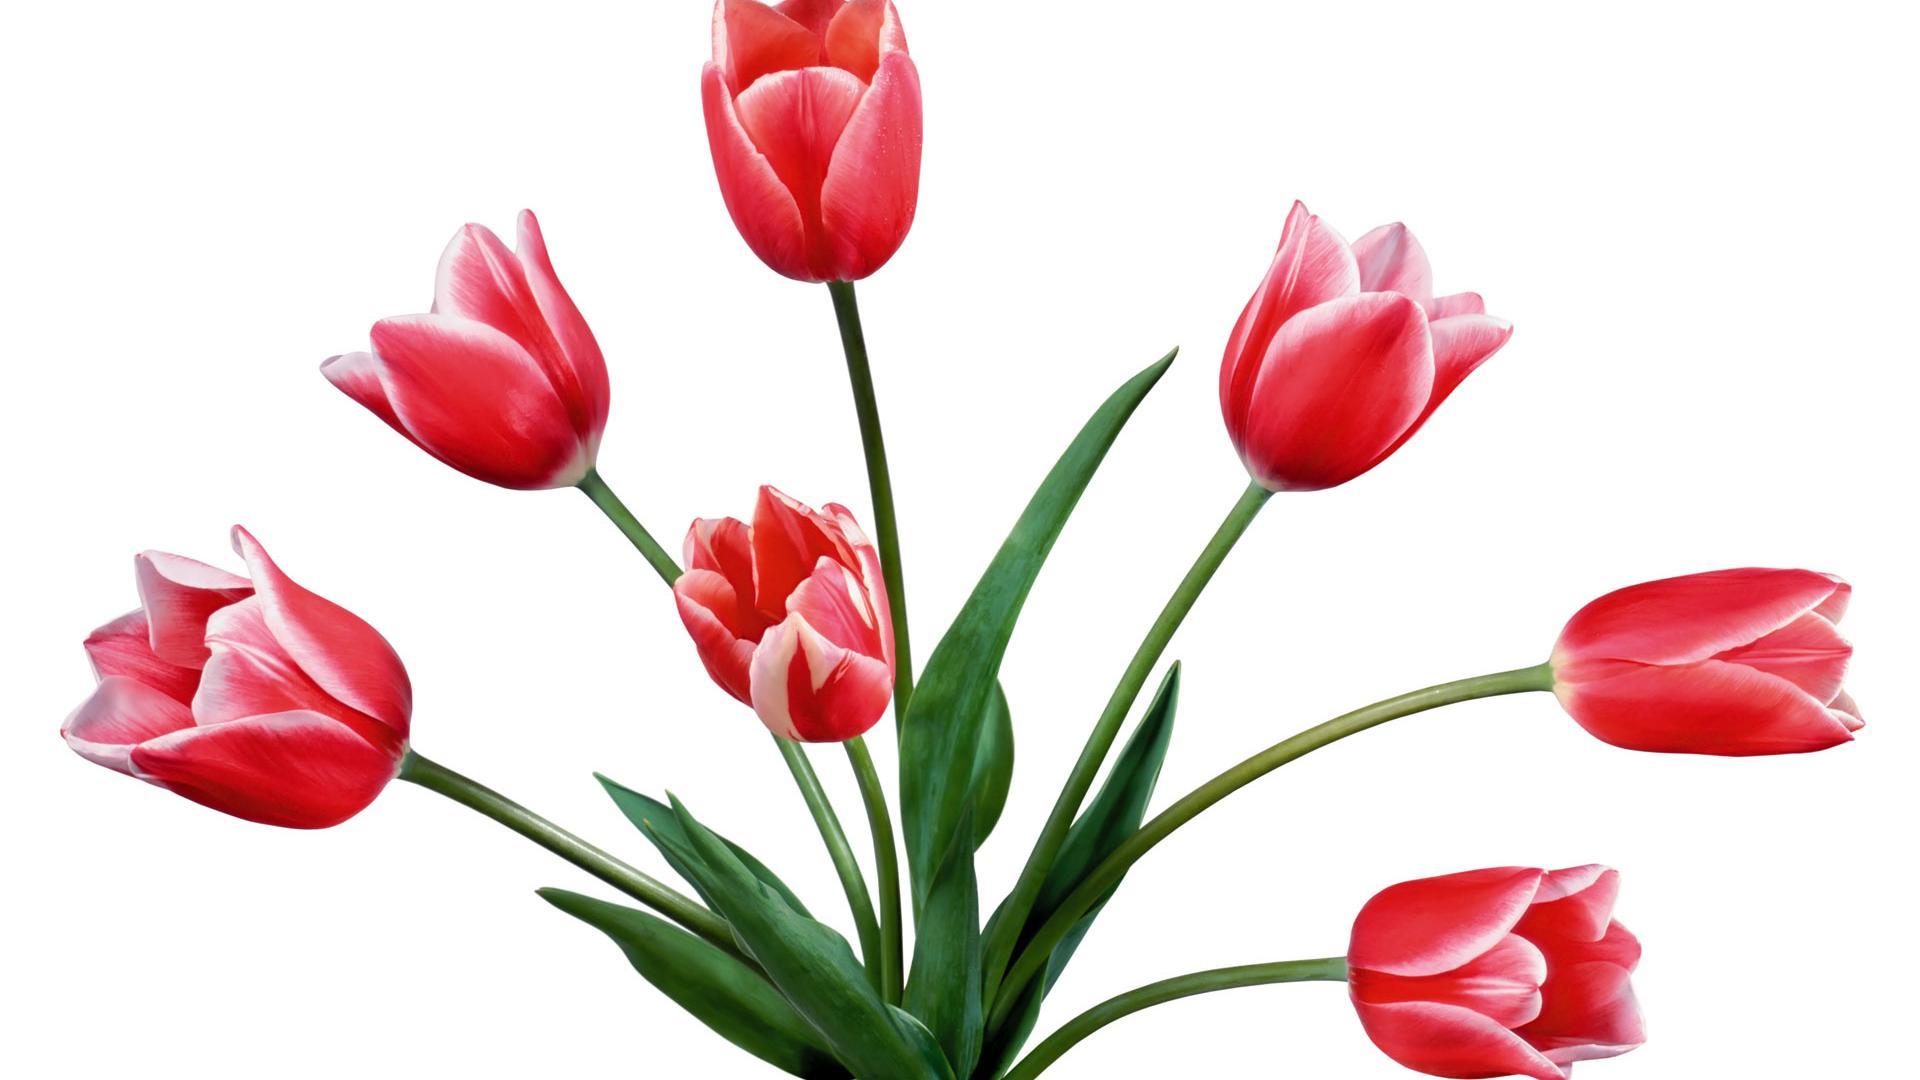 Tulip Flower Drawing - Tulip Clip Art , HD Wallpaper & Backgrounds